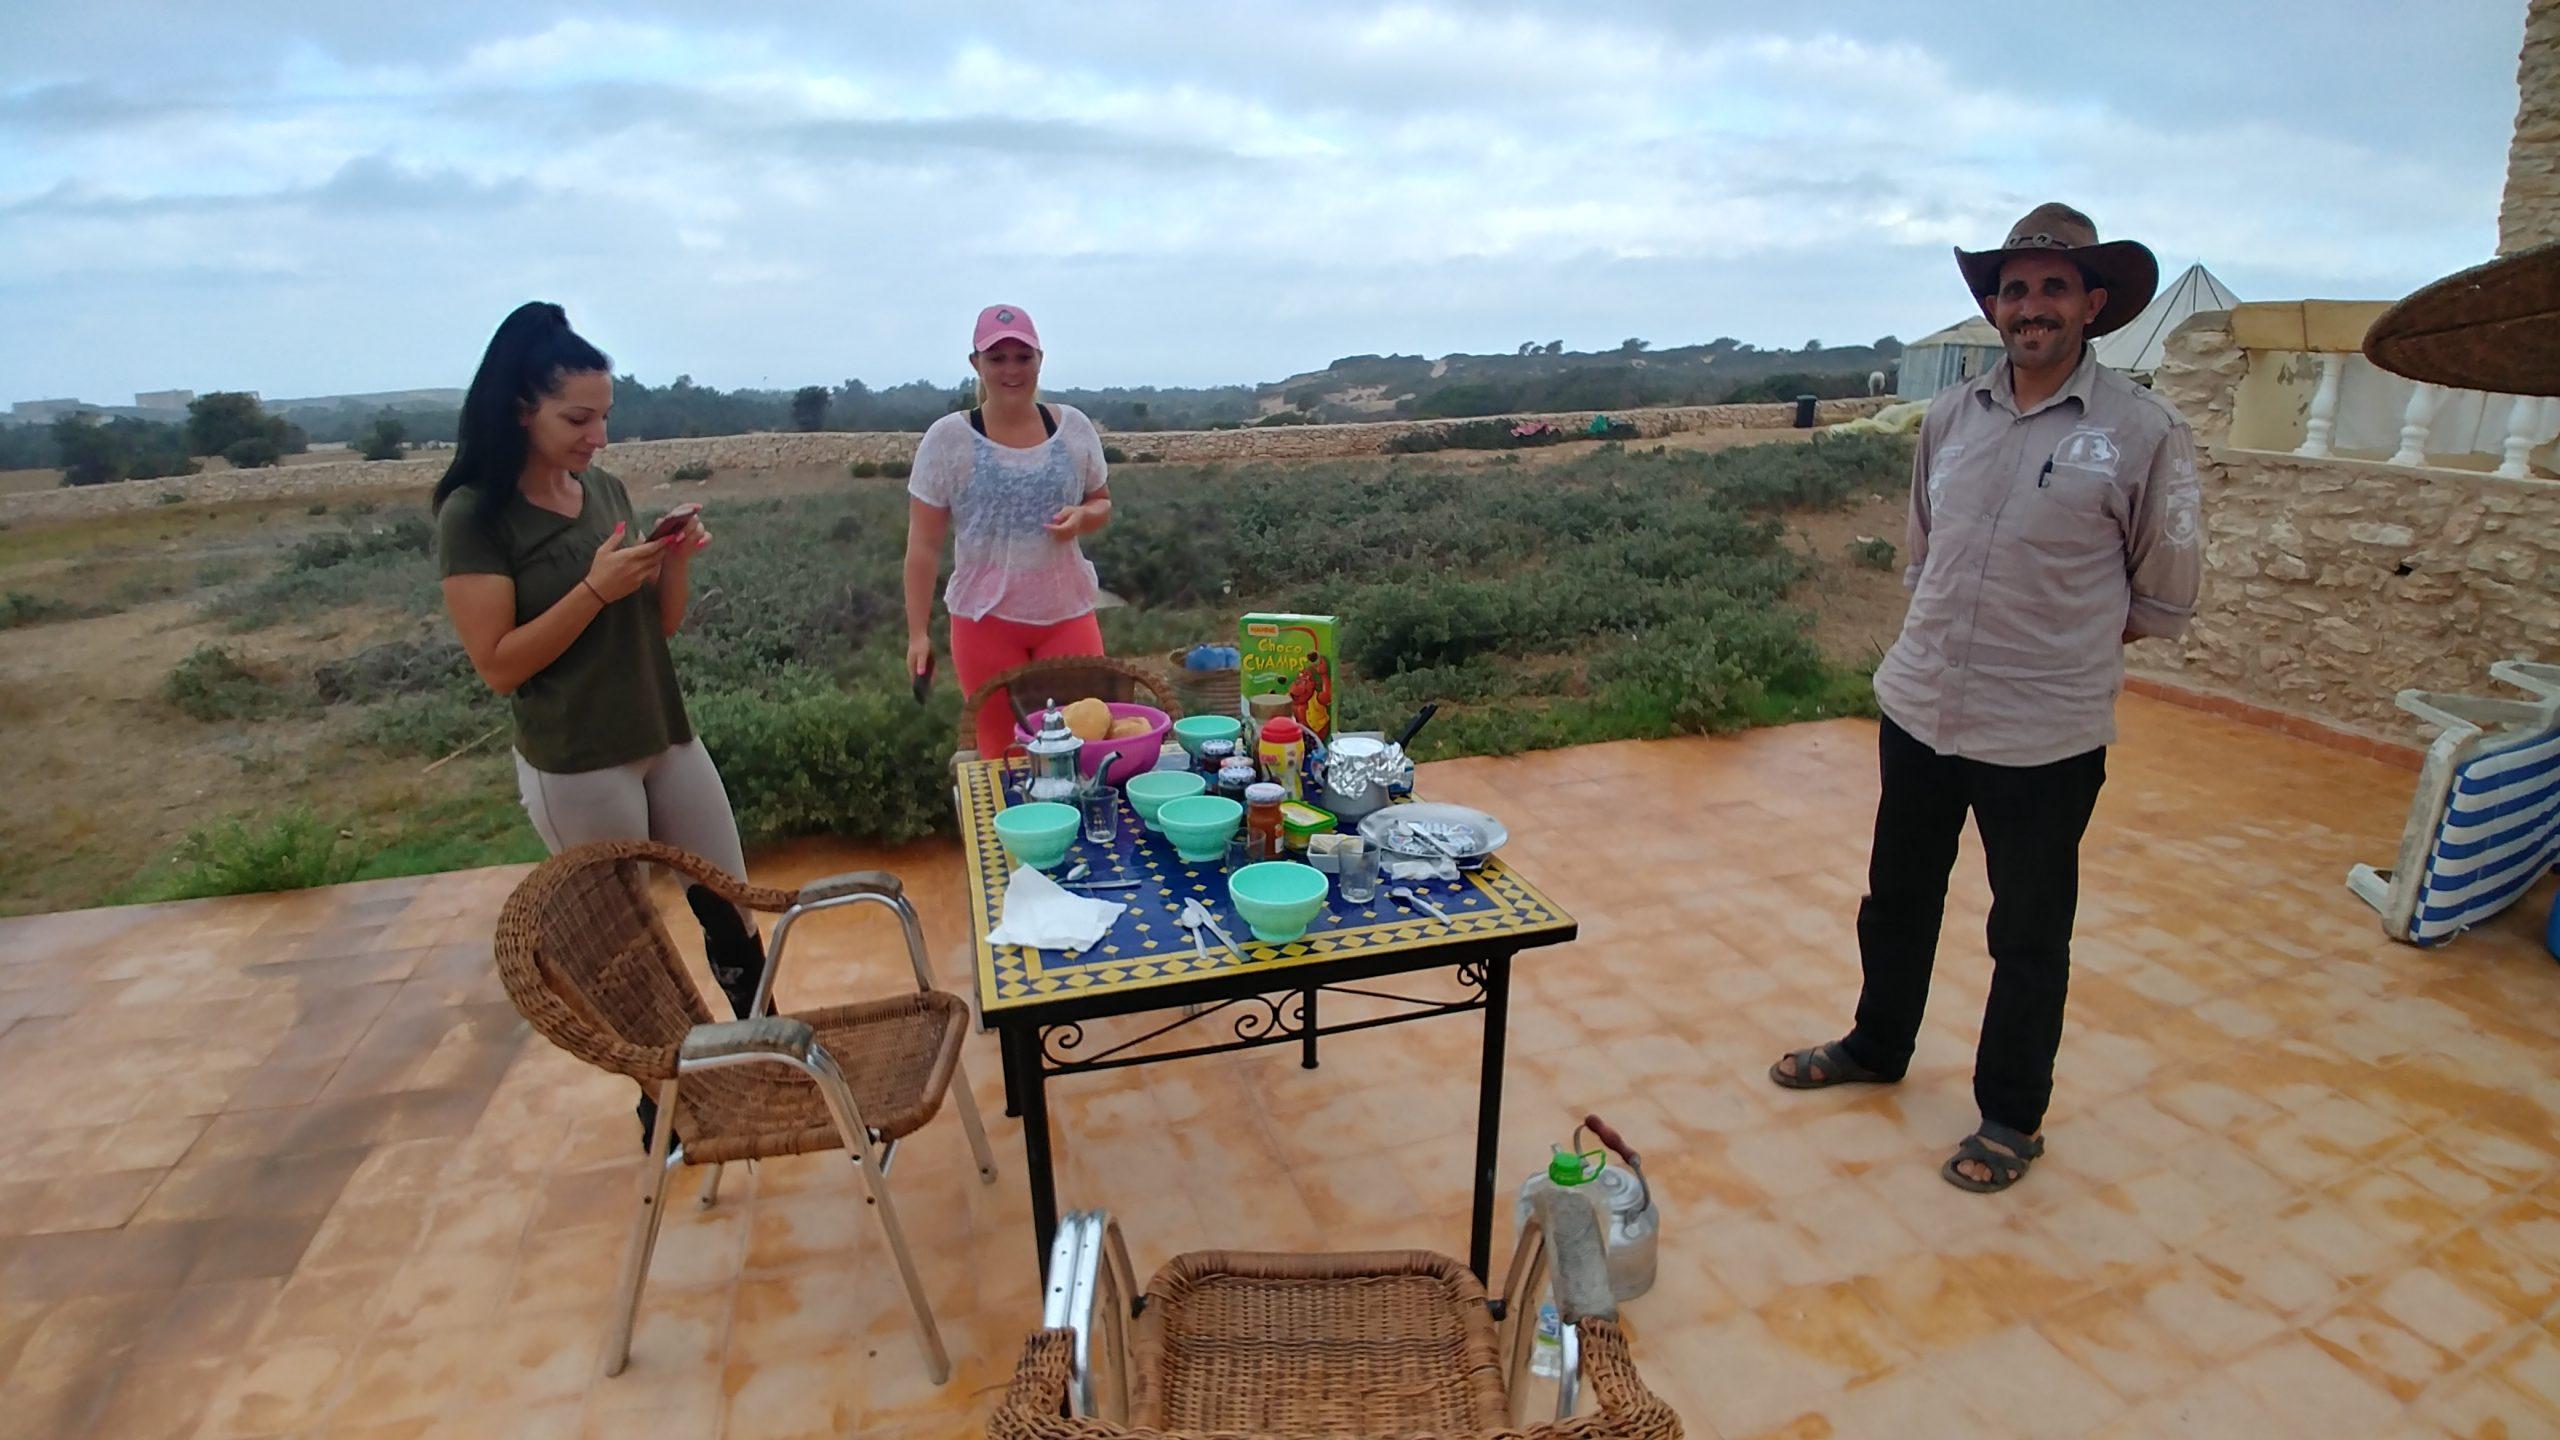 Maroc - Petit-déjeuner à l'auberge de Sidi Kaouki